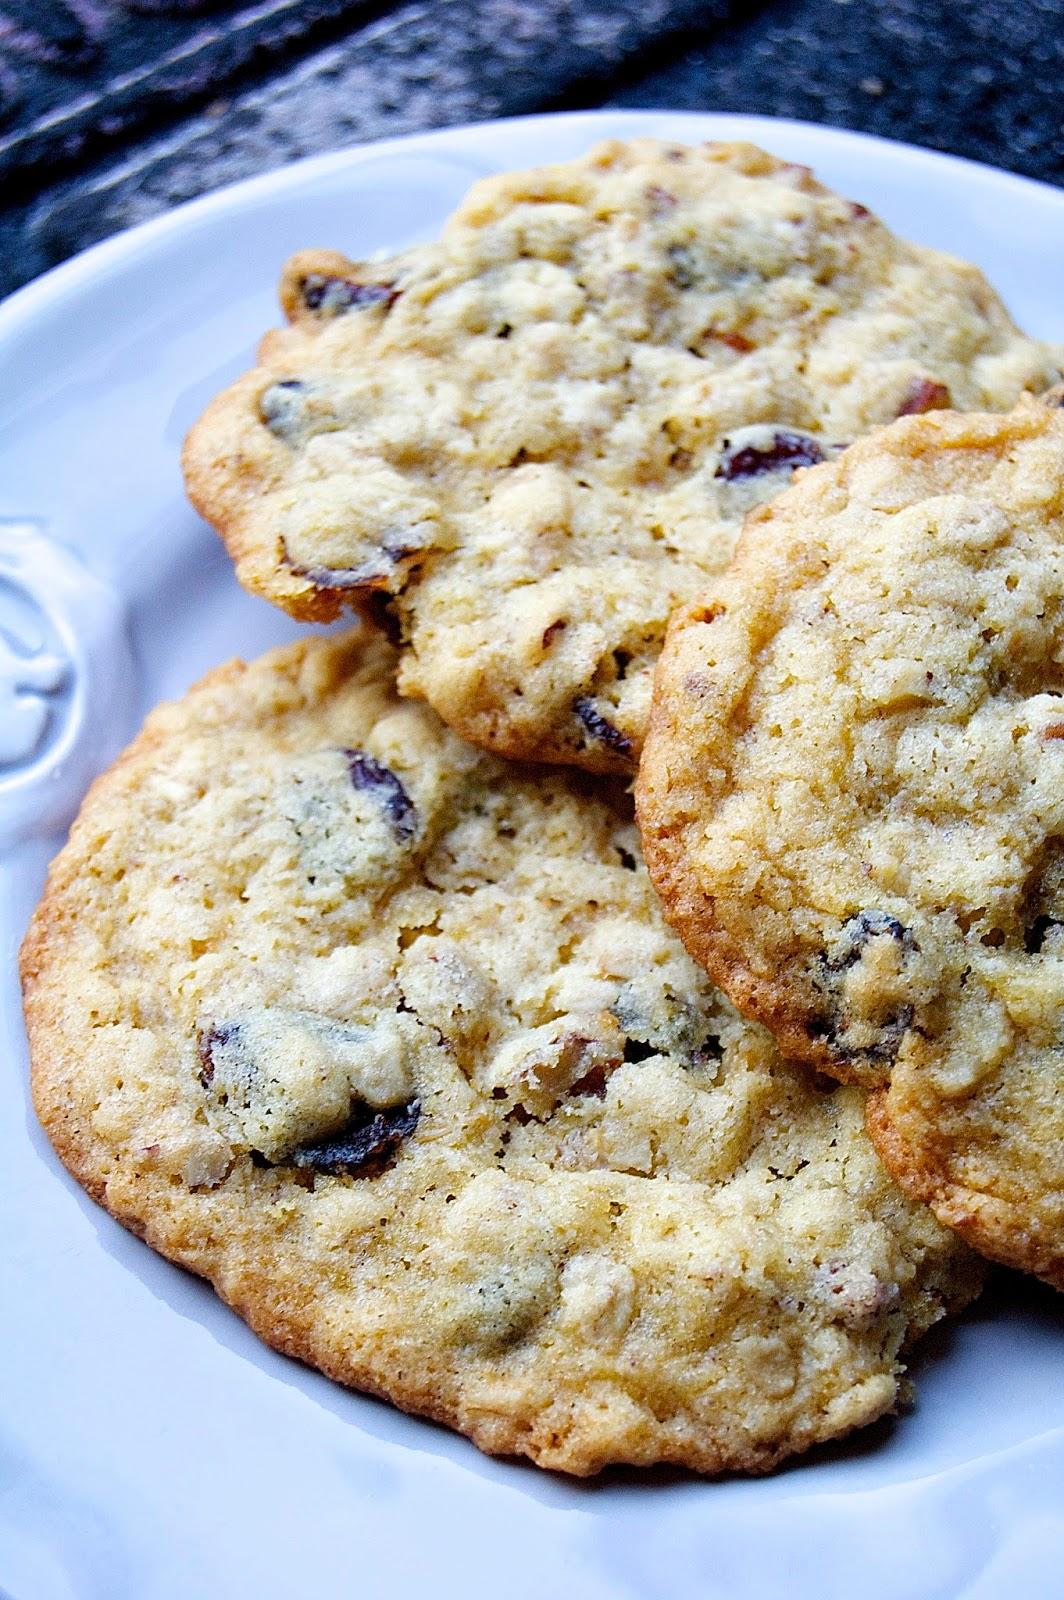 30/30 - #3 Cherry Walnut Oatmeal Cookies